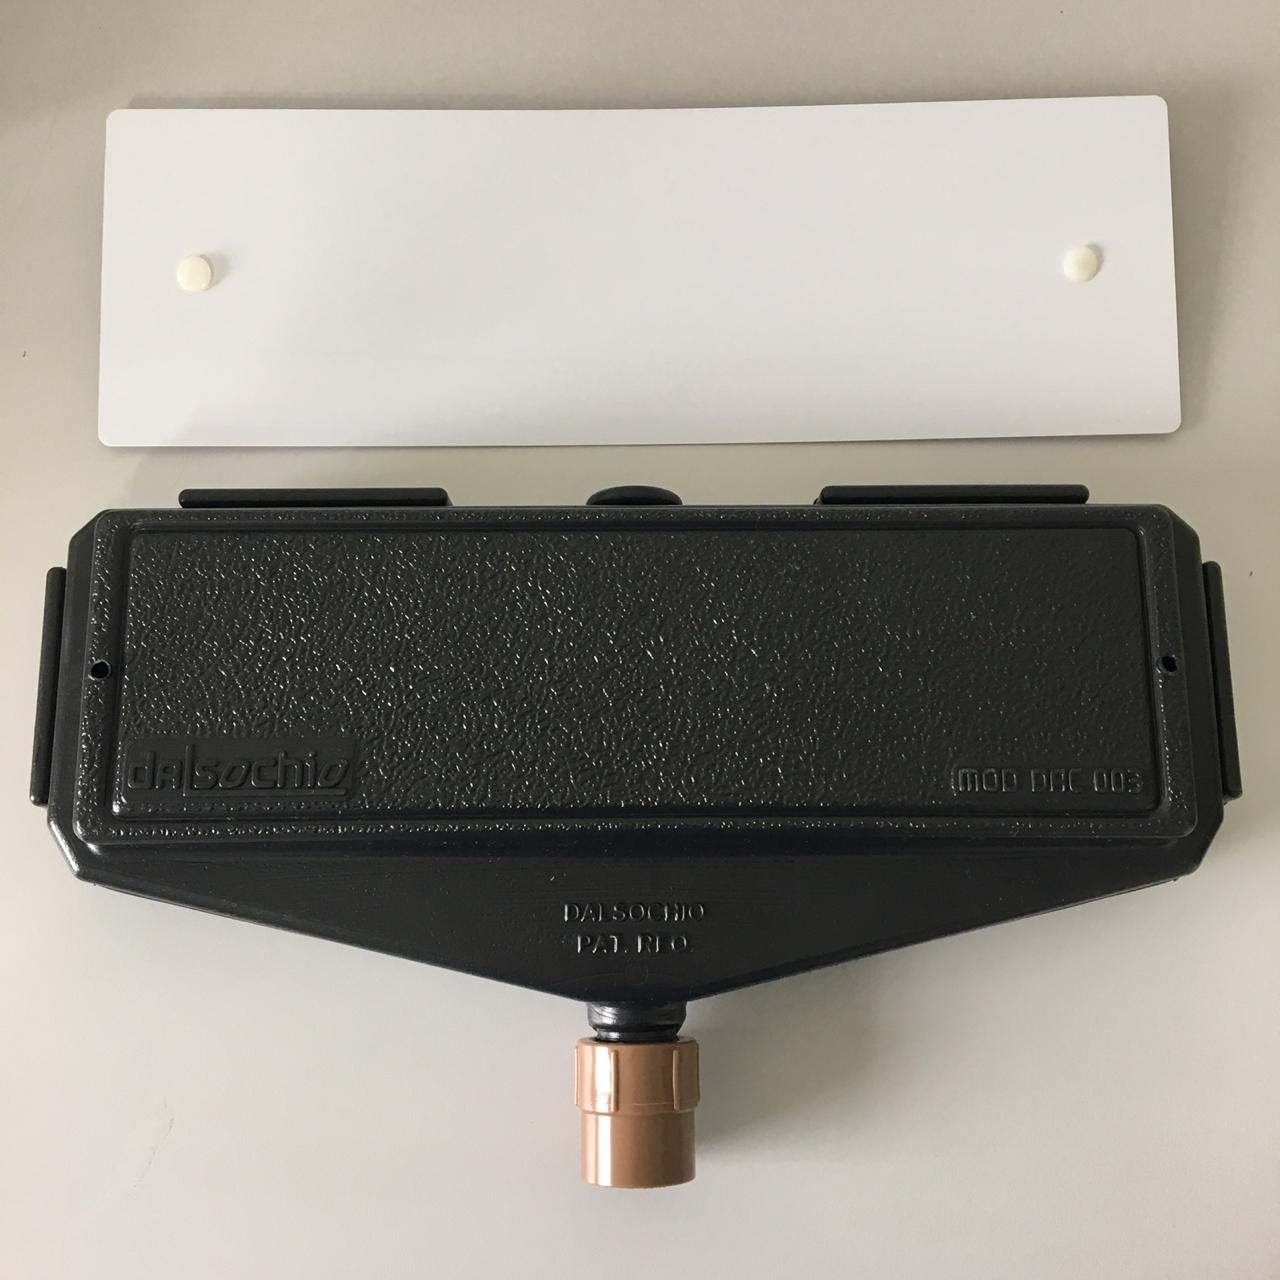 Kit Caixa de Passagem DAC003 + Tampa DAC003 + Luva PVC Rosca 3/4